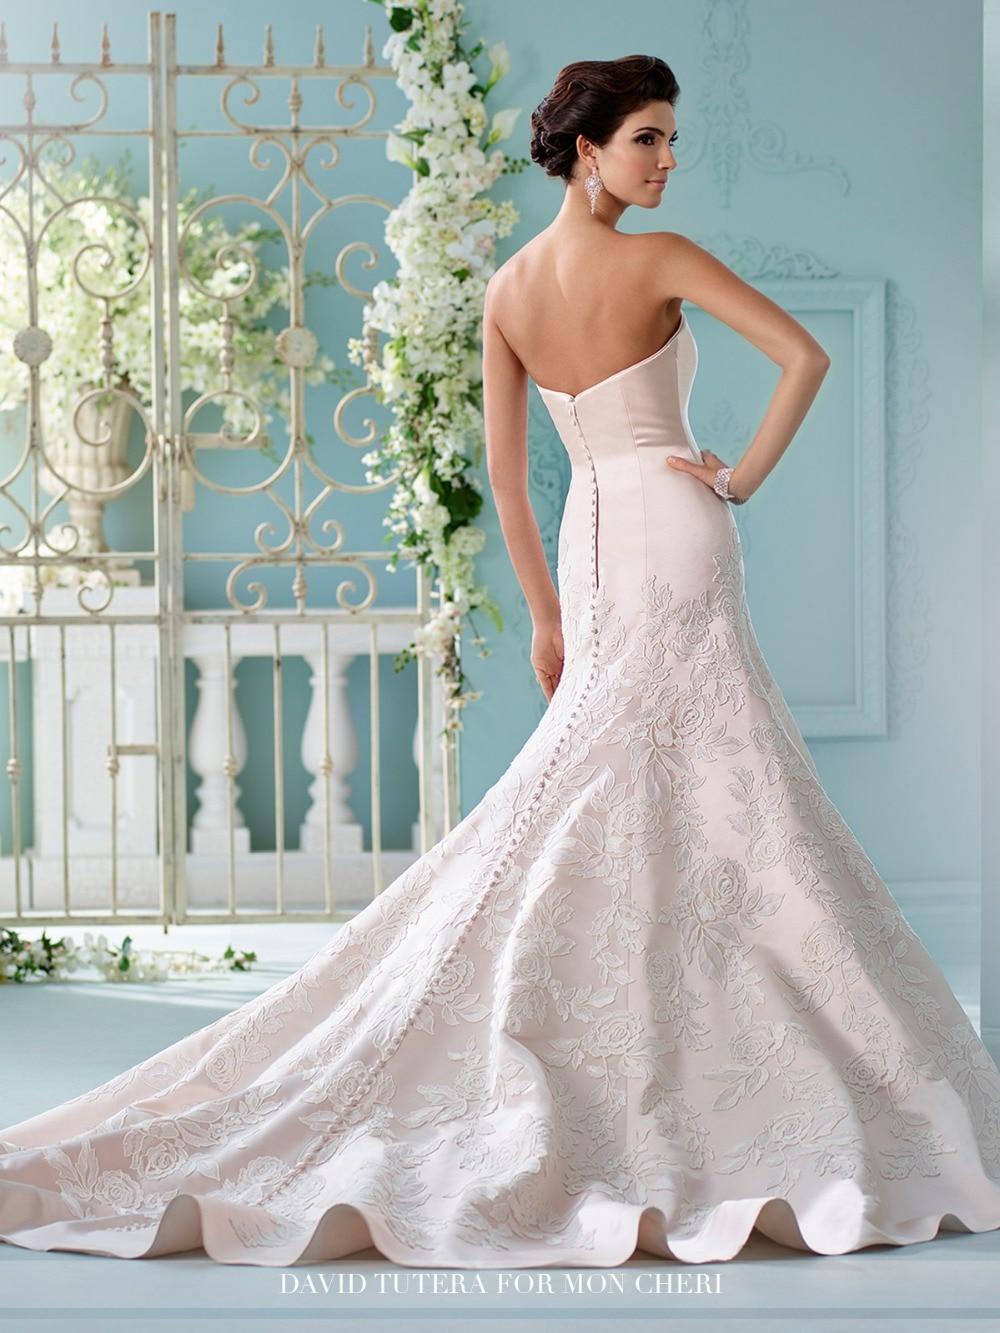 Funky White Wedding Dress With Black Vignette - All Wedding Dresses ...